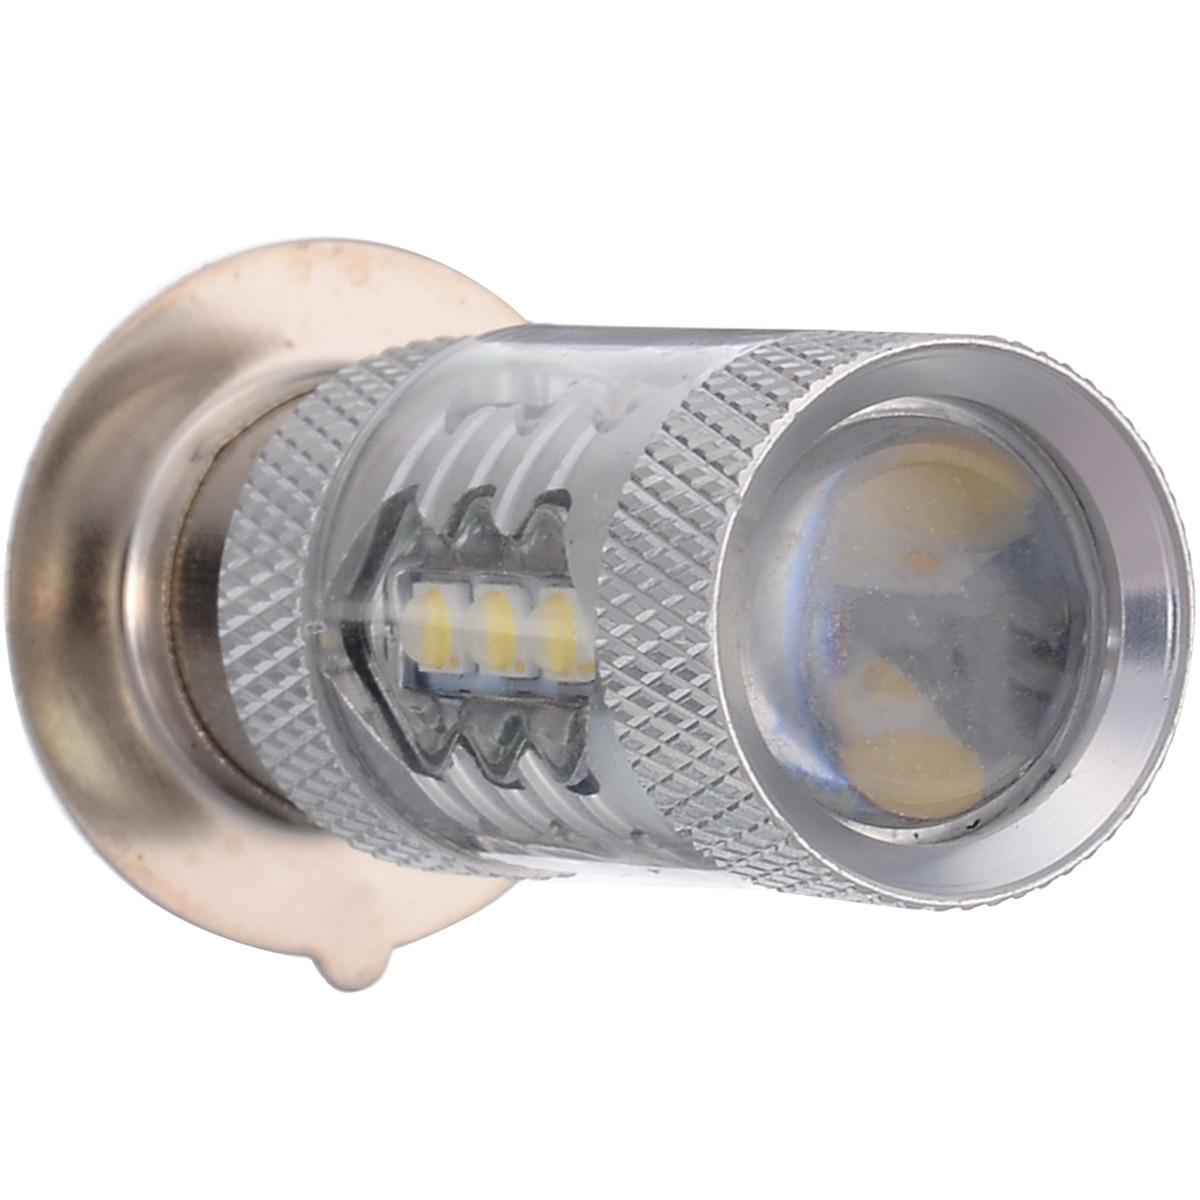 1pcs P15D H6M Motorcycle Headlight DRL Moto 20SMD LED Bulbs Lights 6500K-8500K Motobike Scooter Lamps